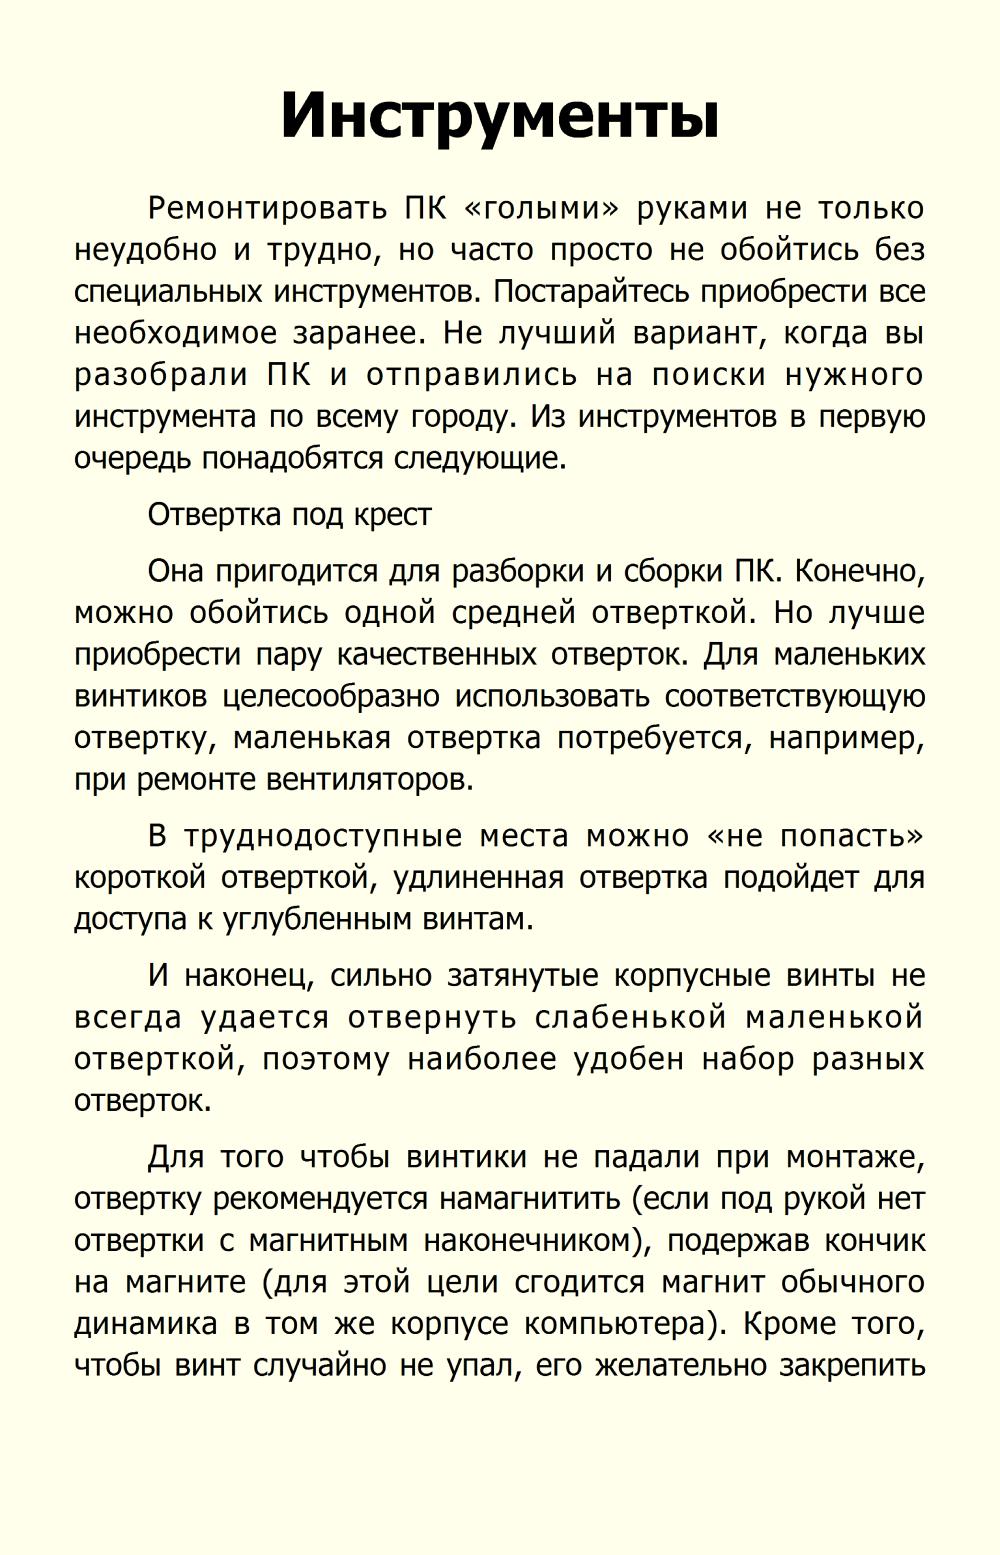 http://i6.imageban.ru/out/2013/10/22/7bd80110cbb2bd961edaa8c5f217d98c.jpg